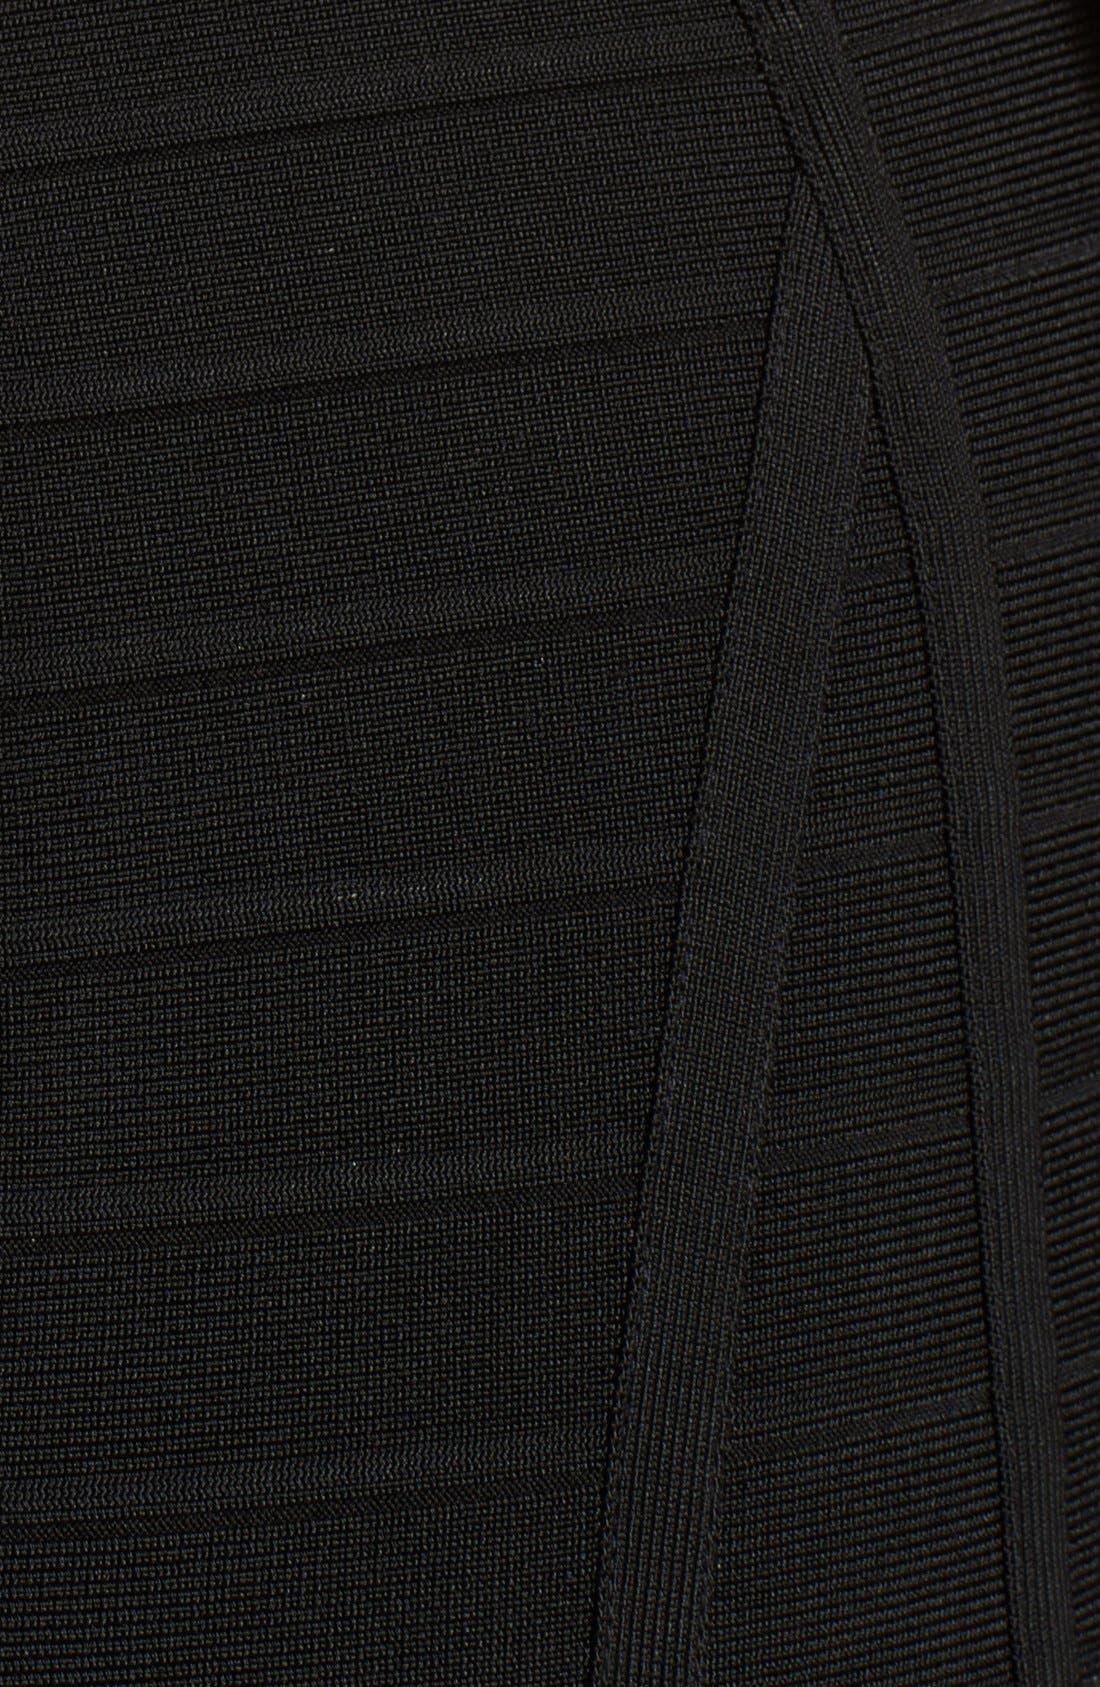 Alternate Image 3  - Herve Leger Chain Detail Flared Bandage Dress